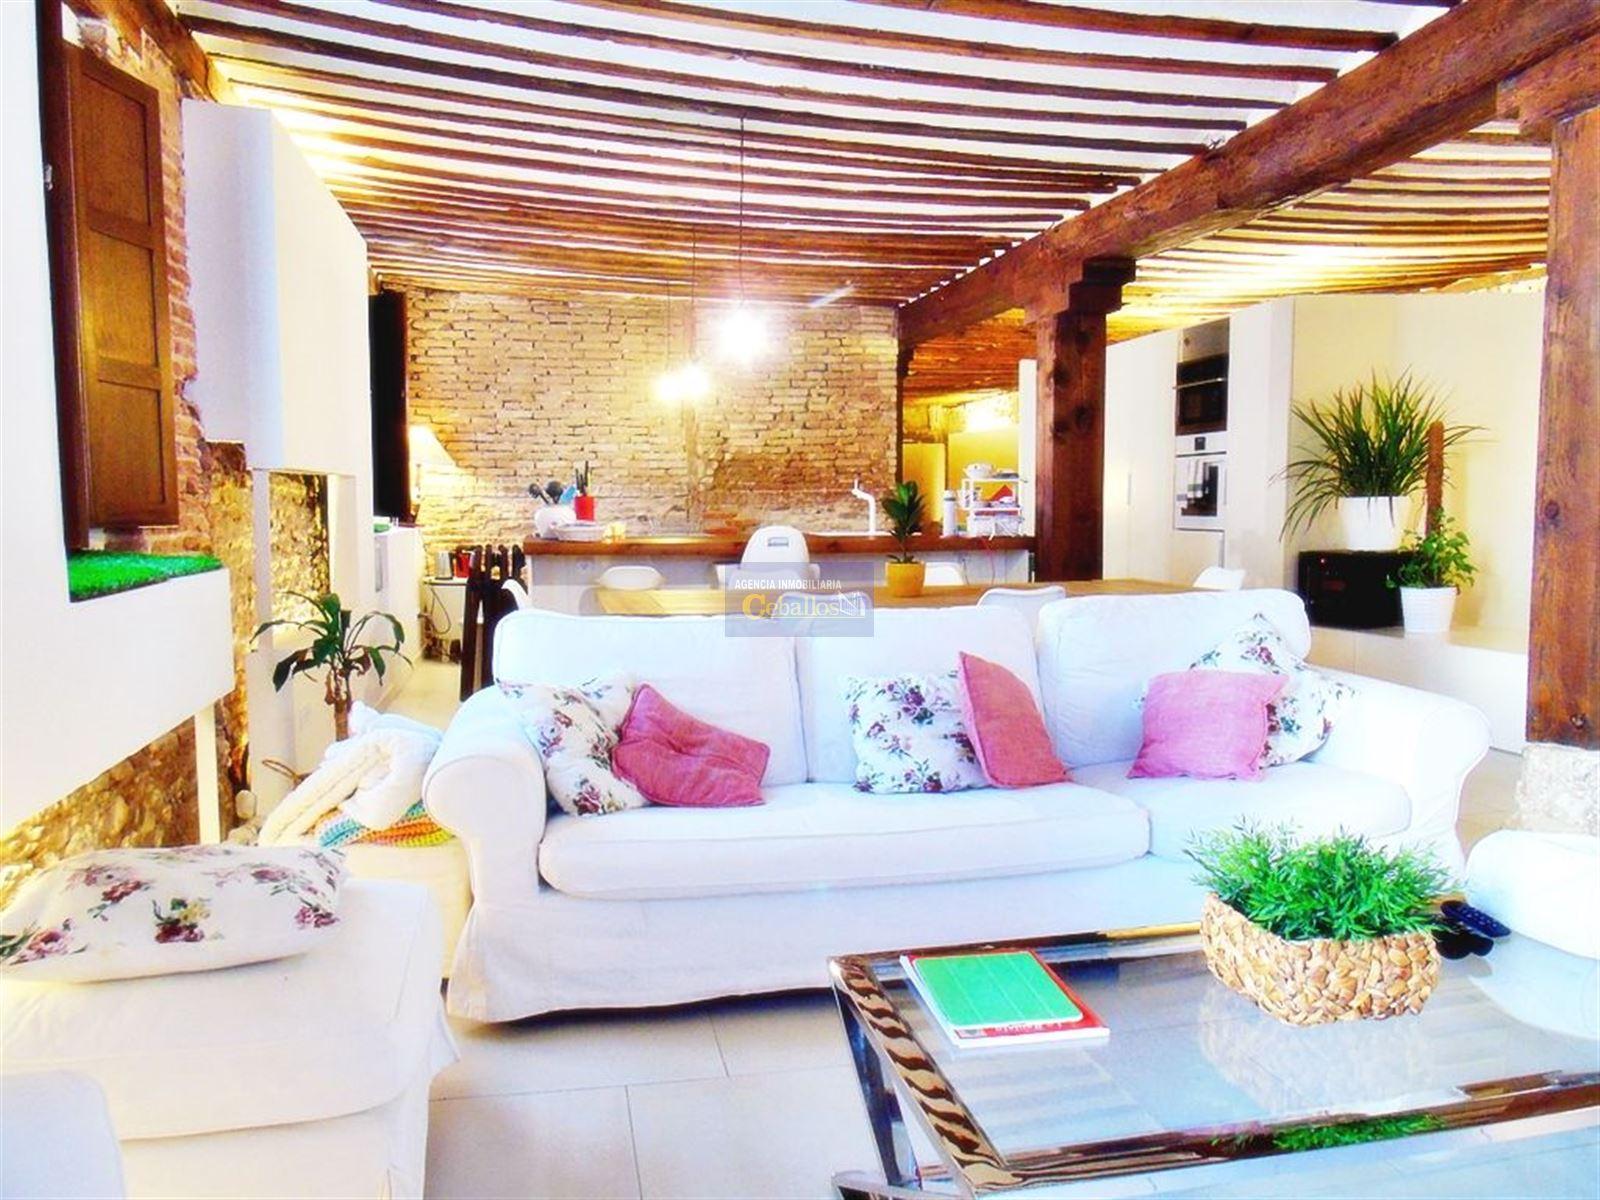 TERRACED HOUSE in ALCALA DE HENARES